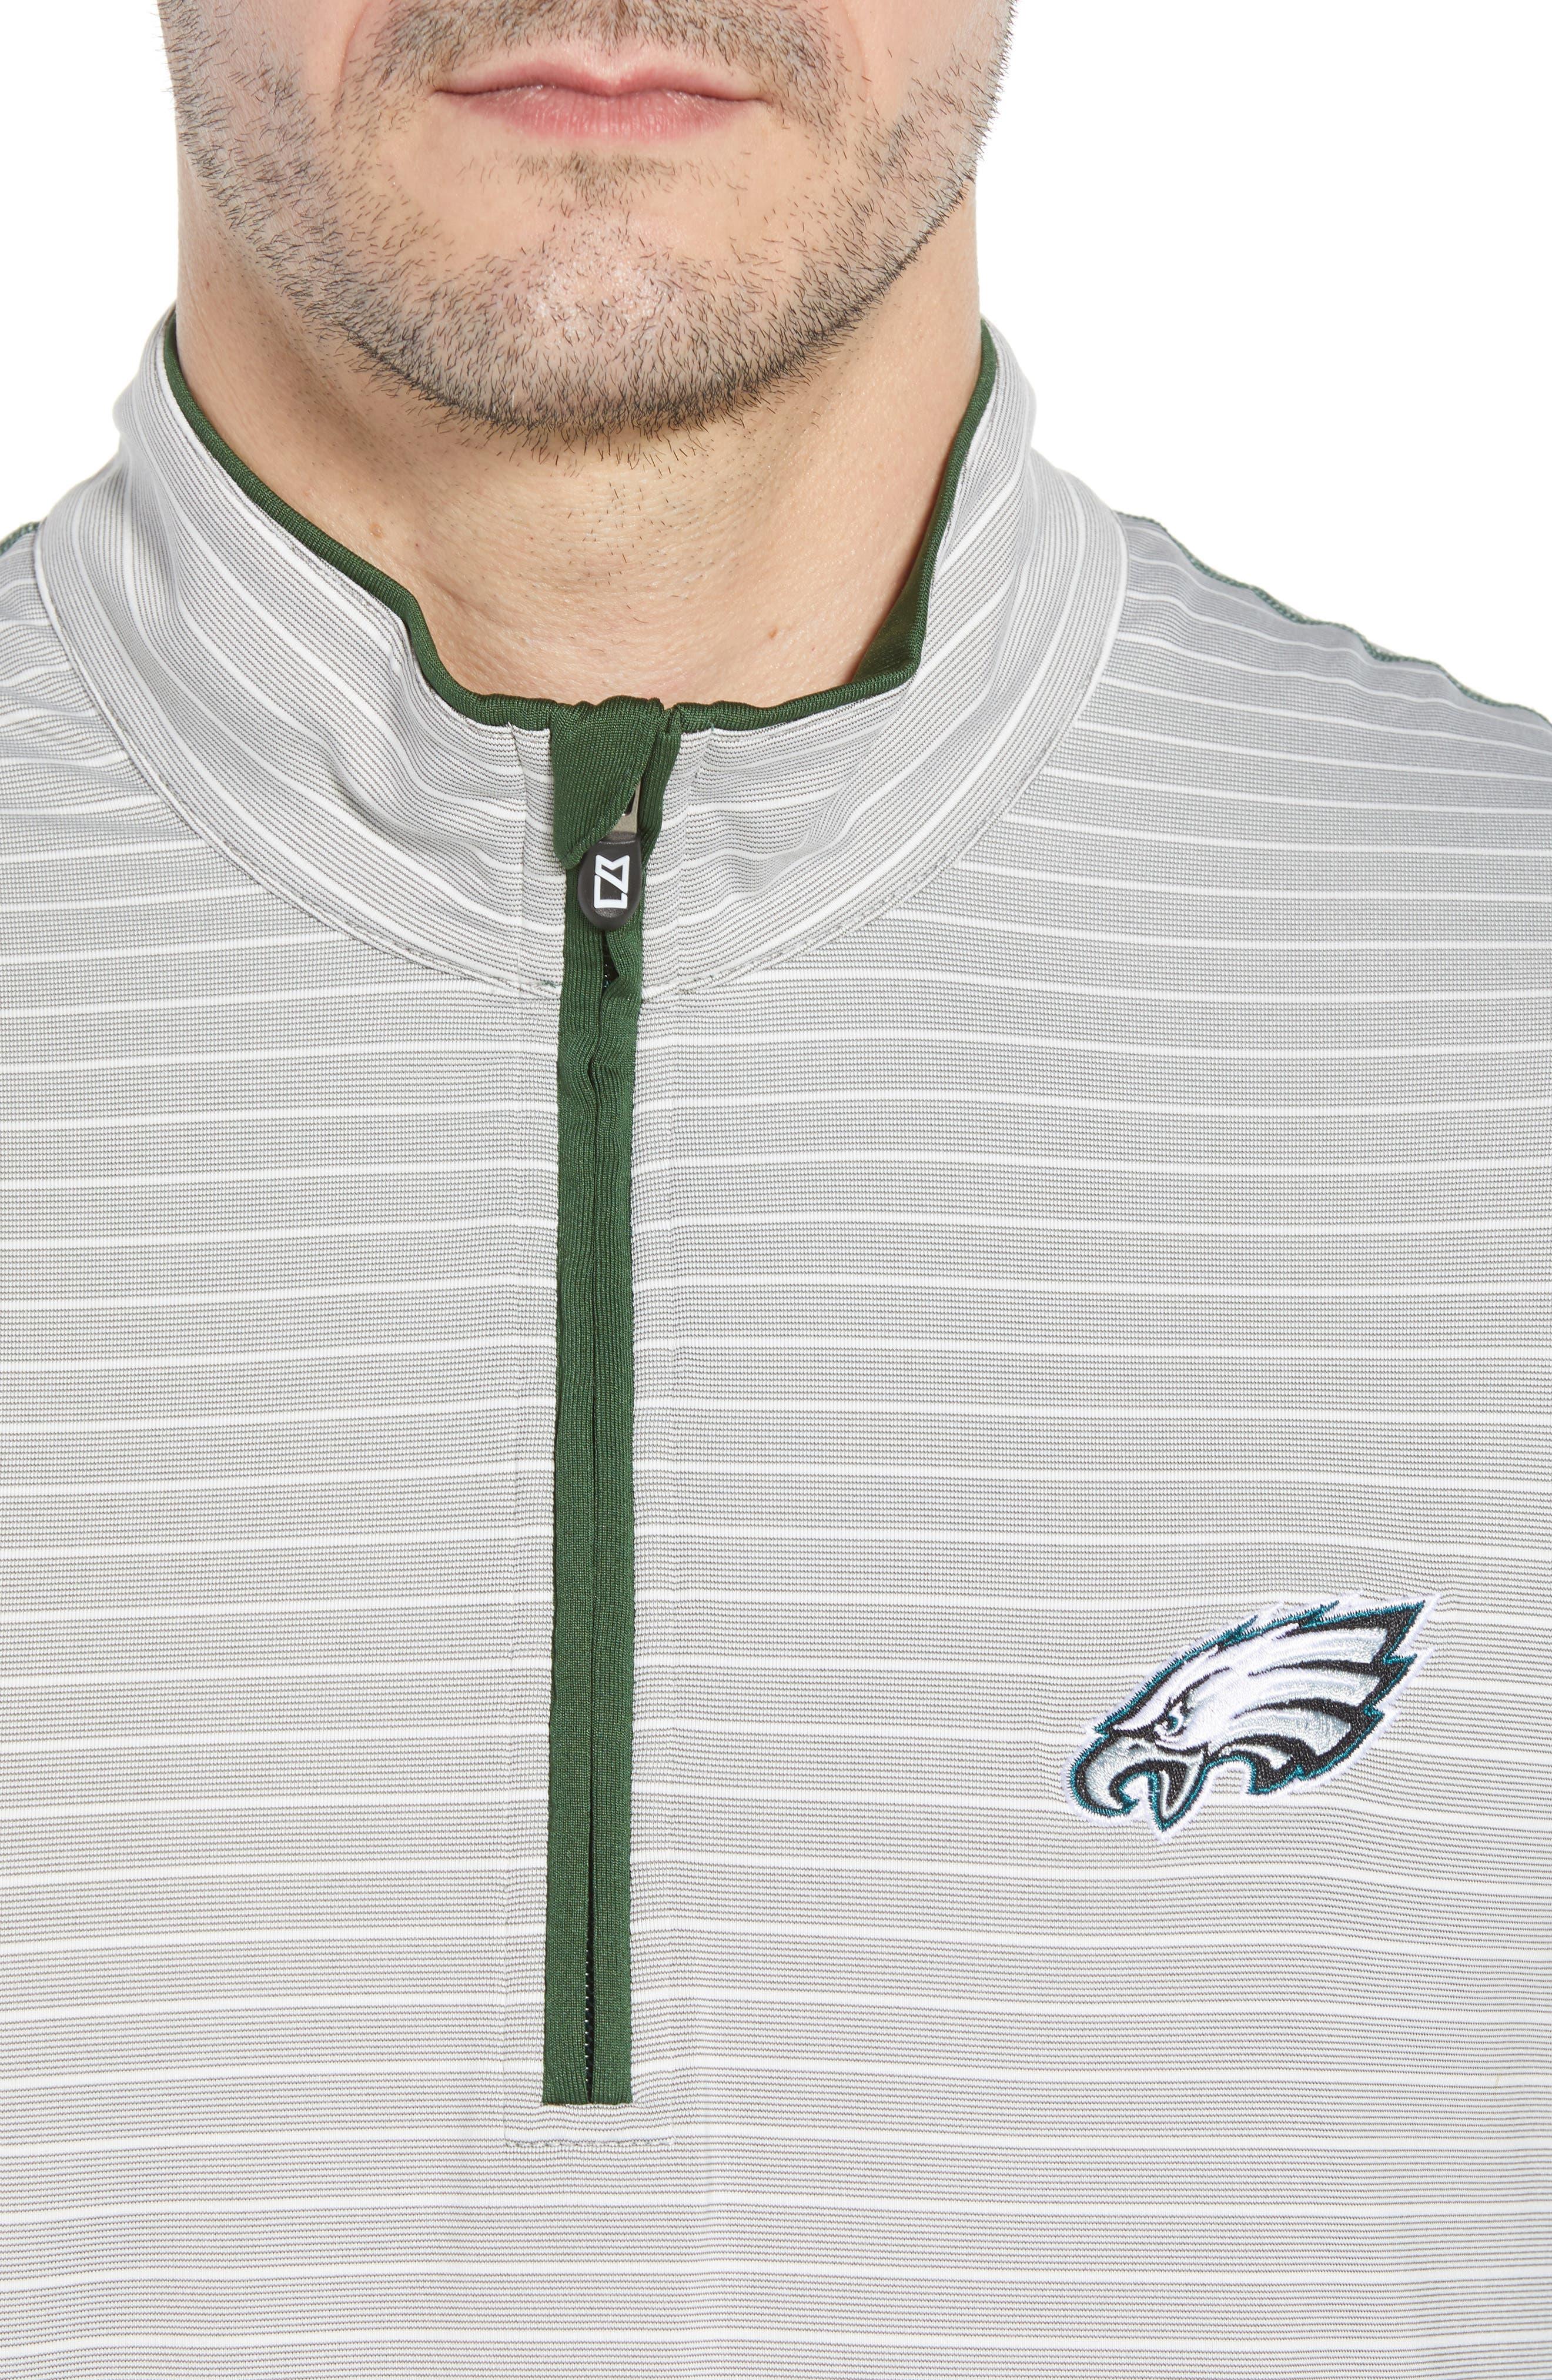 Meridian - Philadelphia Eagles Regular Fit Half Zip Pullover,                             Alternate thumbnail 4, color,                             HUNTER GREEN